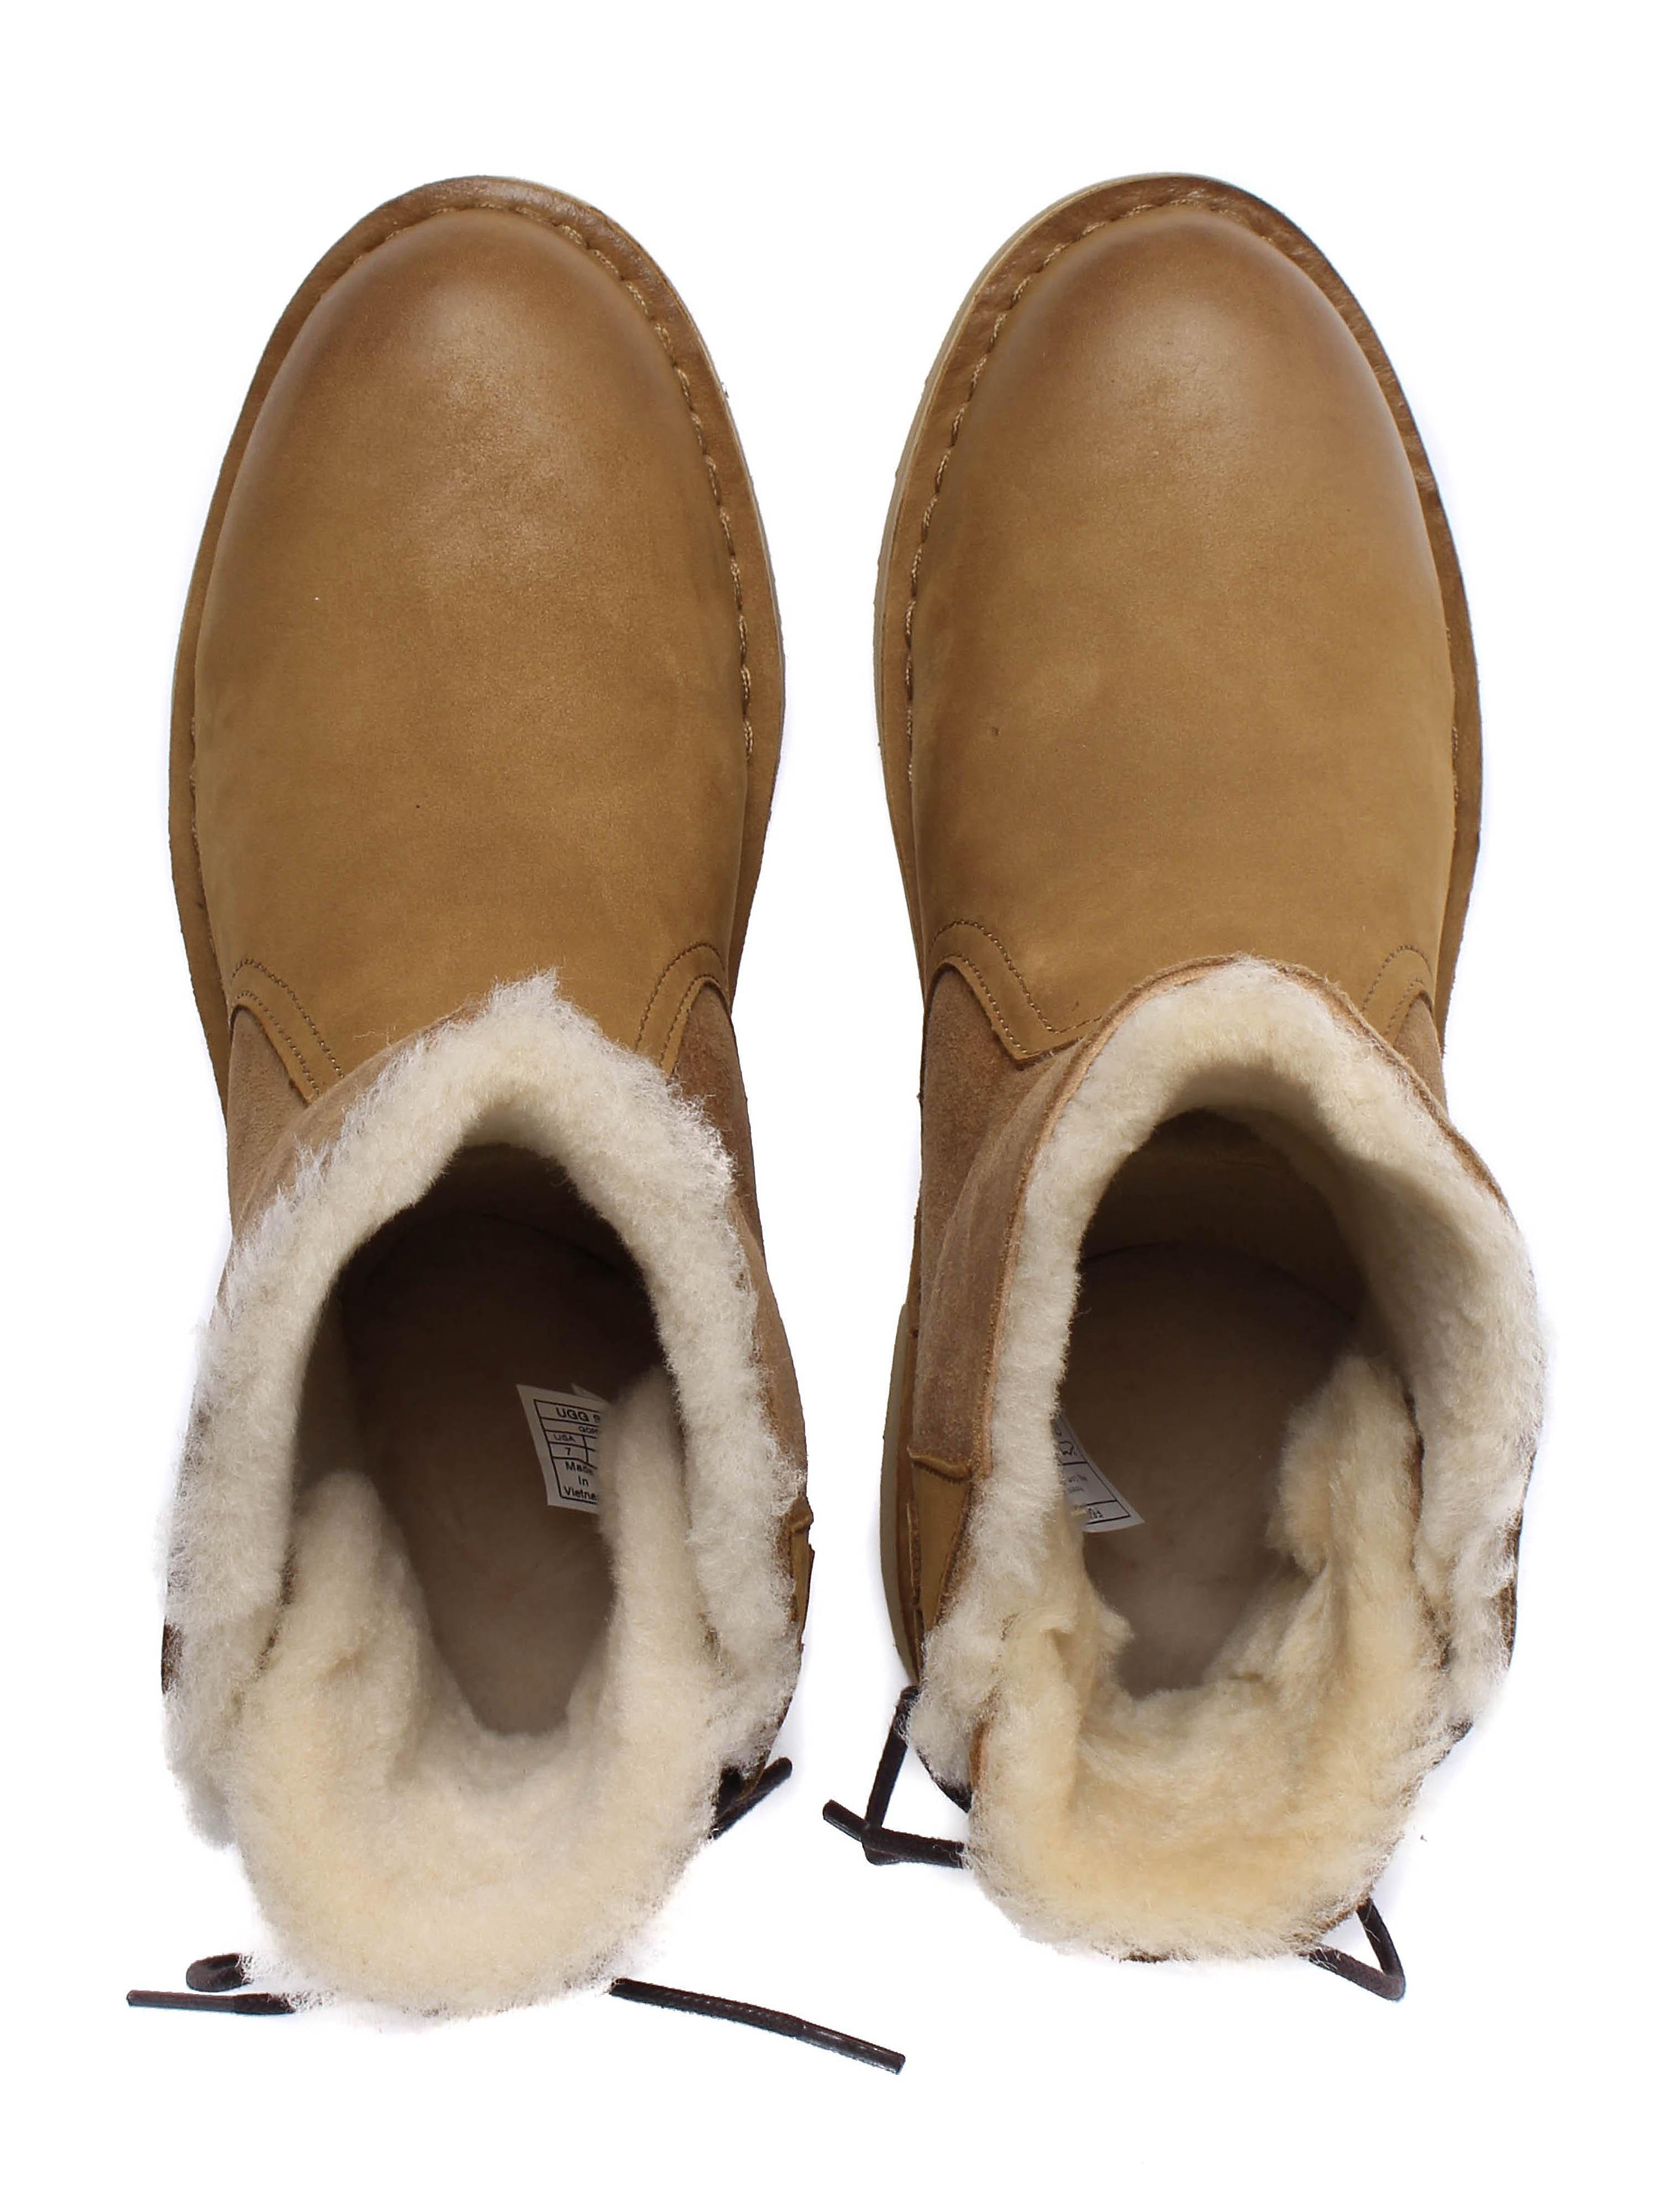 UGG Women's Naiyah Boots - Chestnut